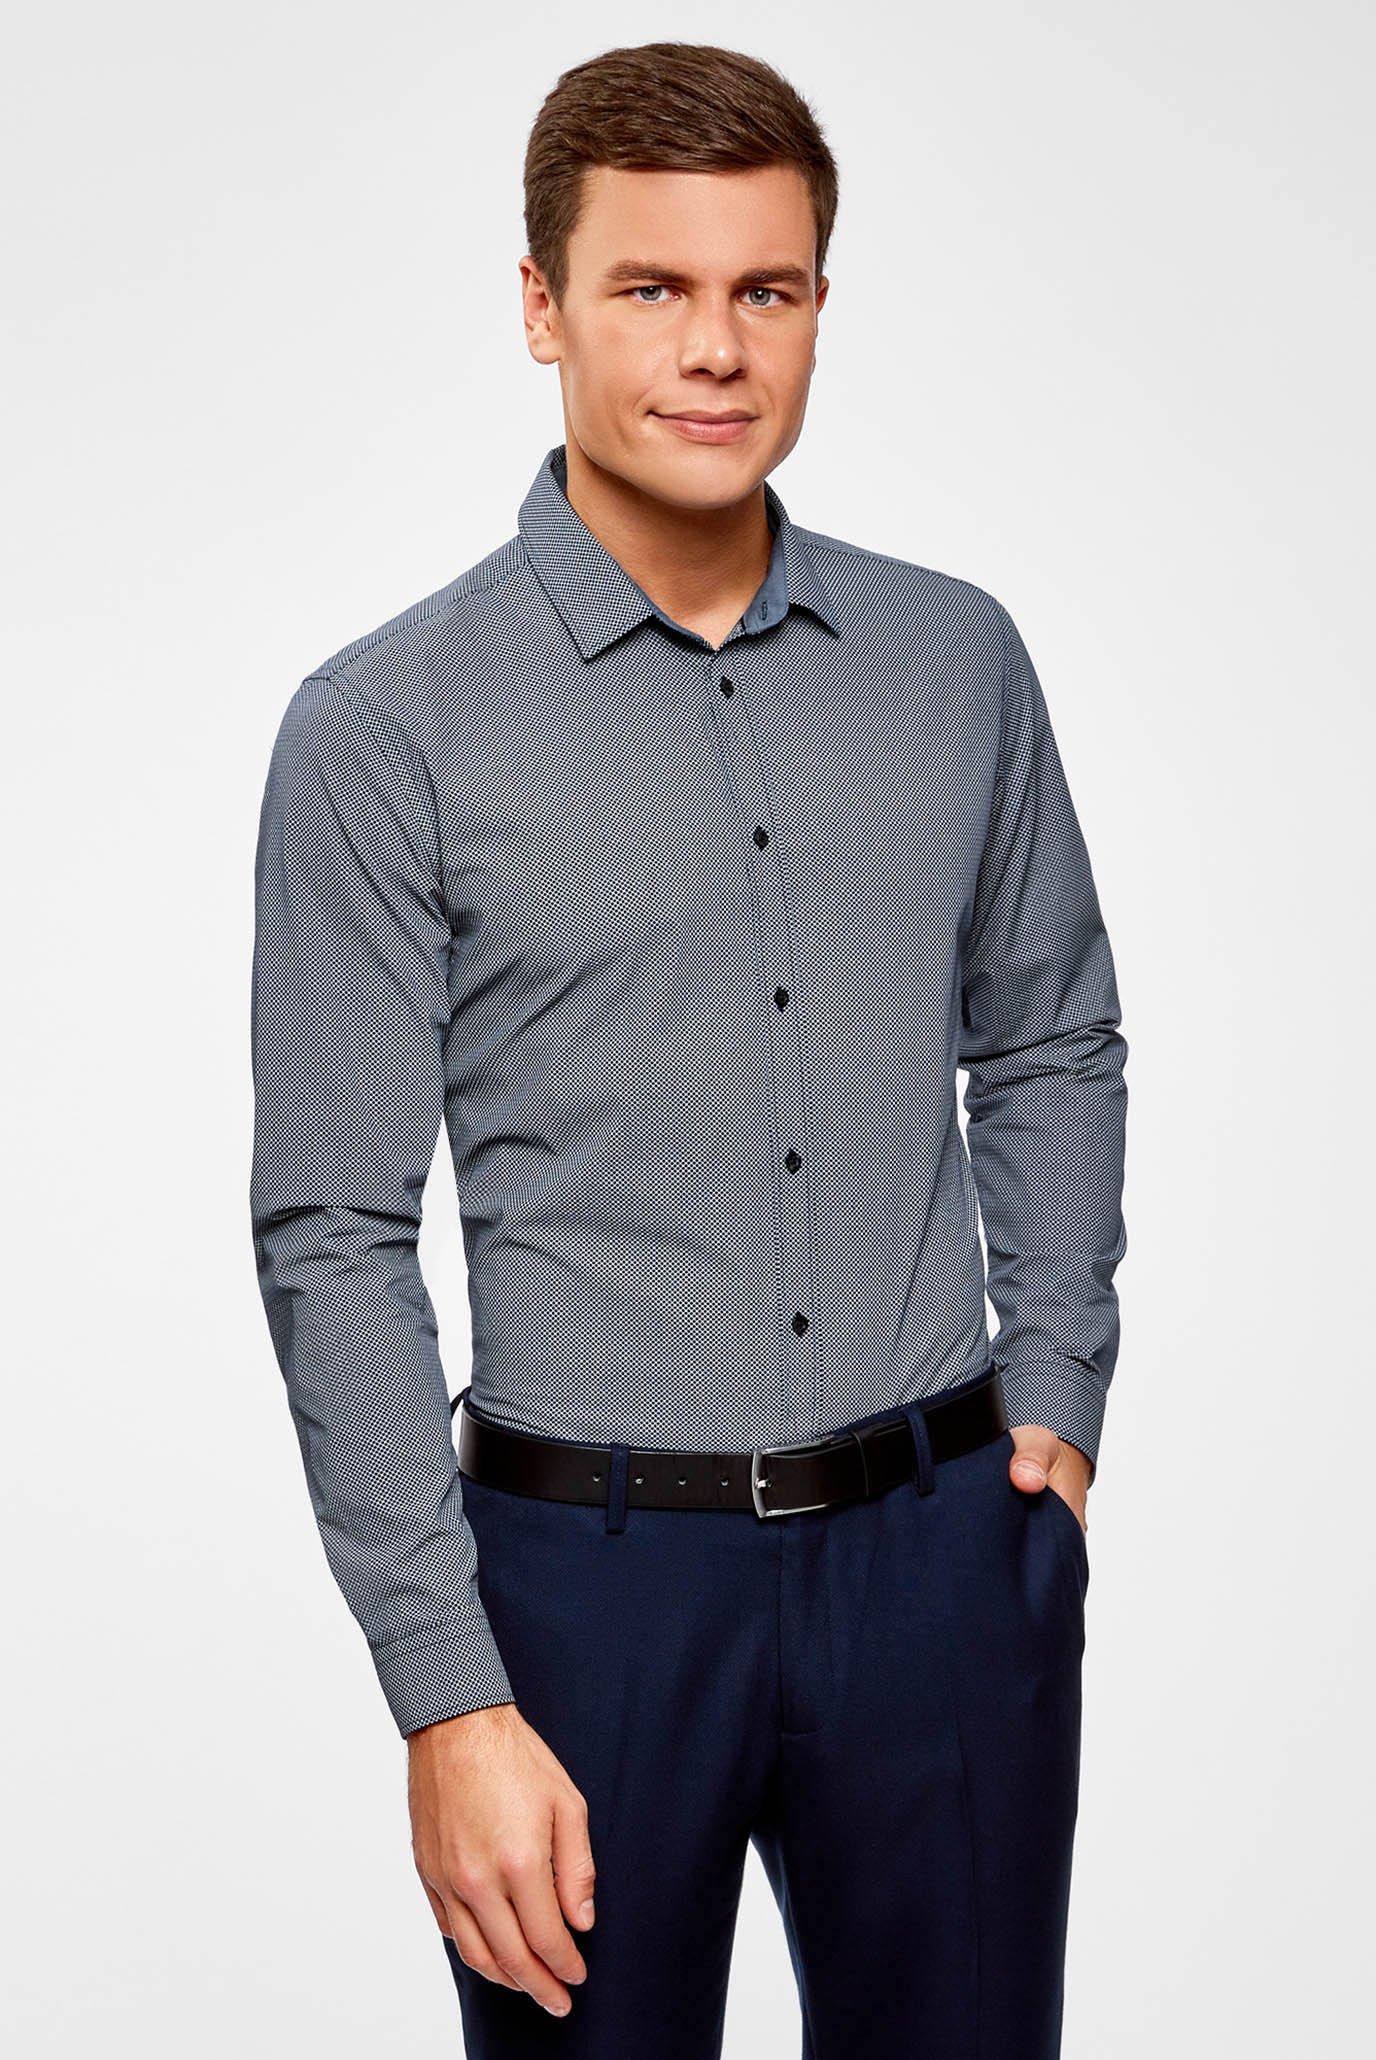 d98f2ea28431a50 Купить Мужская темно-синяя рубашка Oodji Oodji 3L110279M/19370N/7910G –  Киев, Украина. Цены в интернет магазине ...